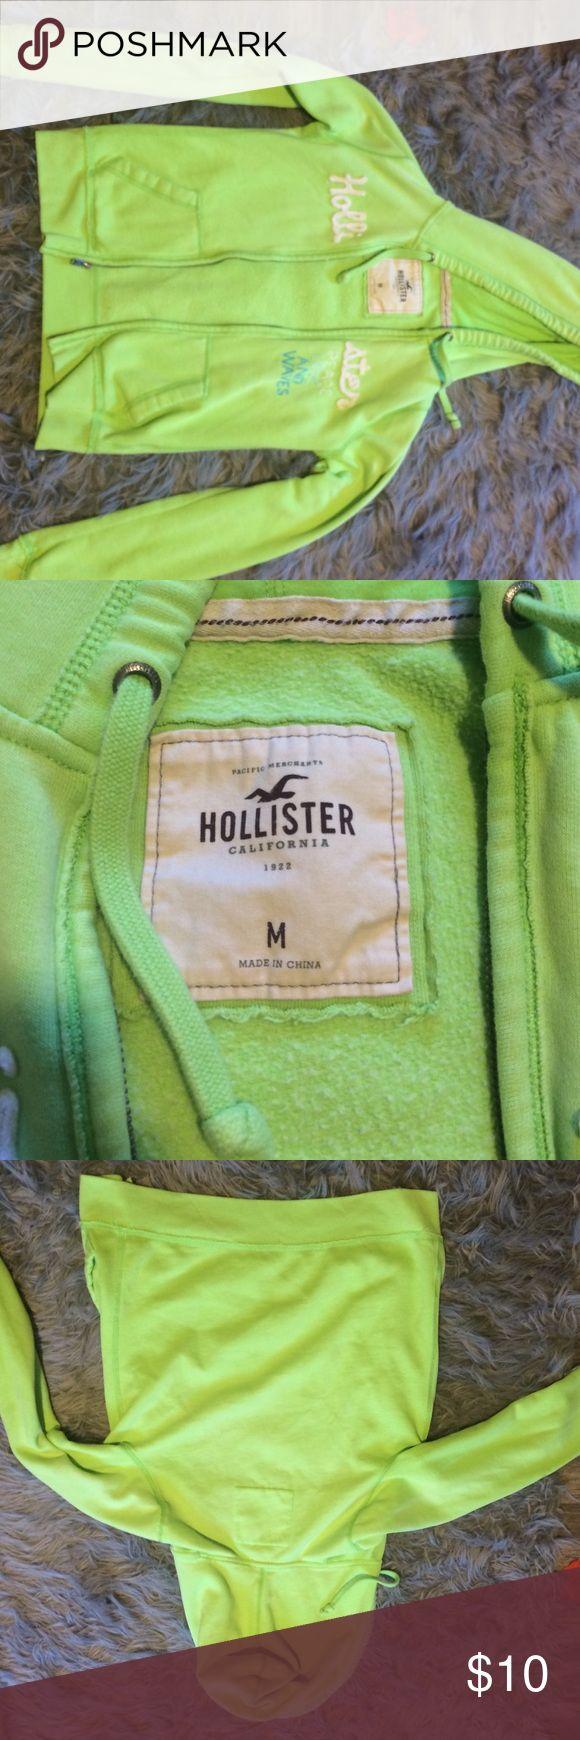 HOLLISTER JACKET hollister jacket size m, but fits like an adult small Hollister Jackets & Coats